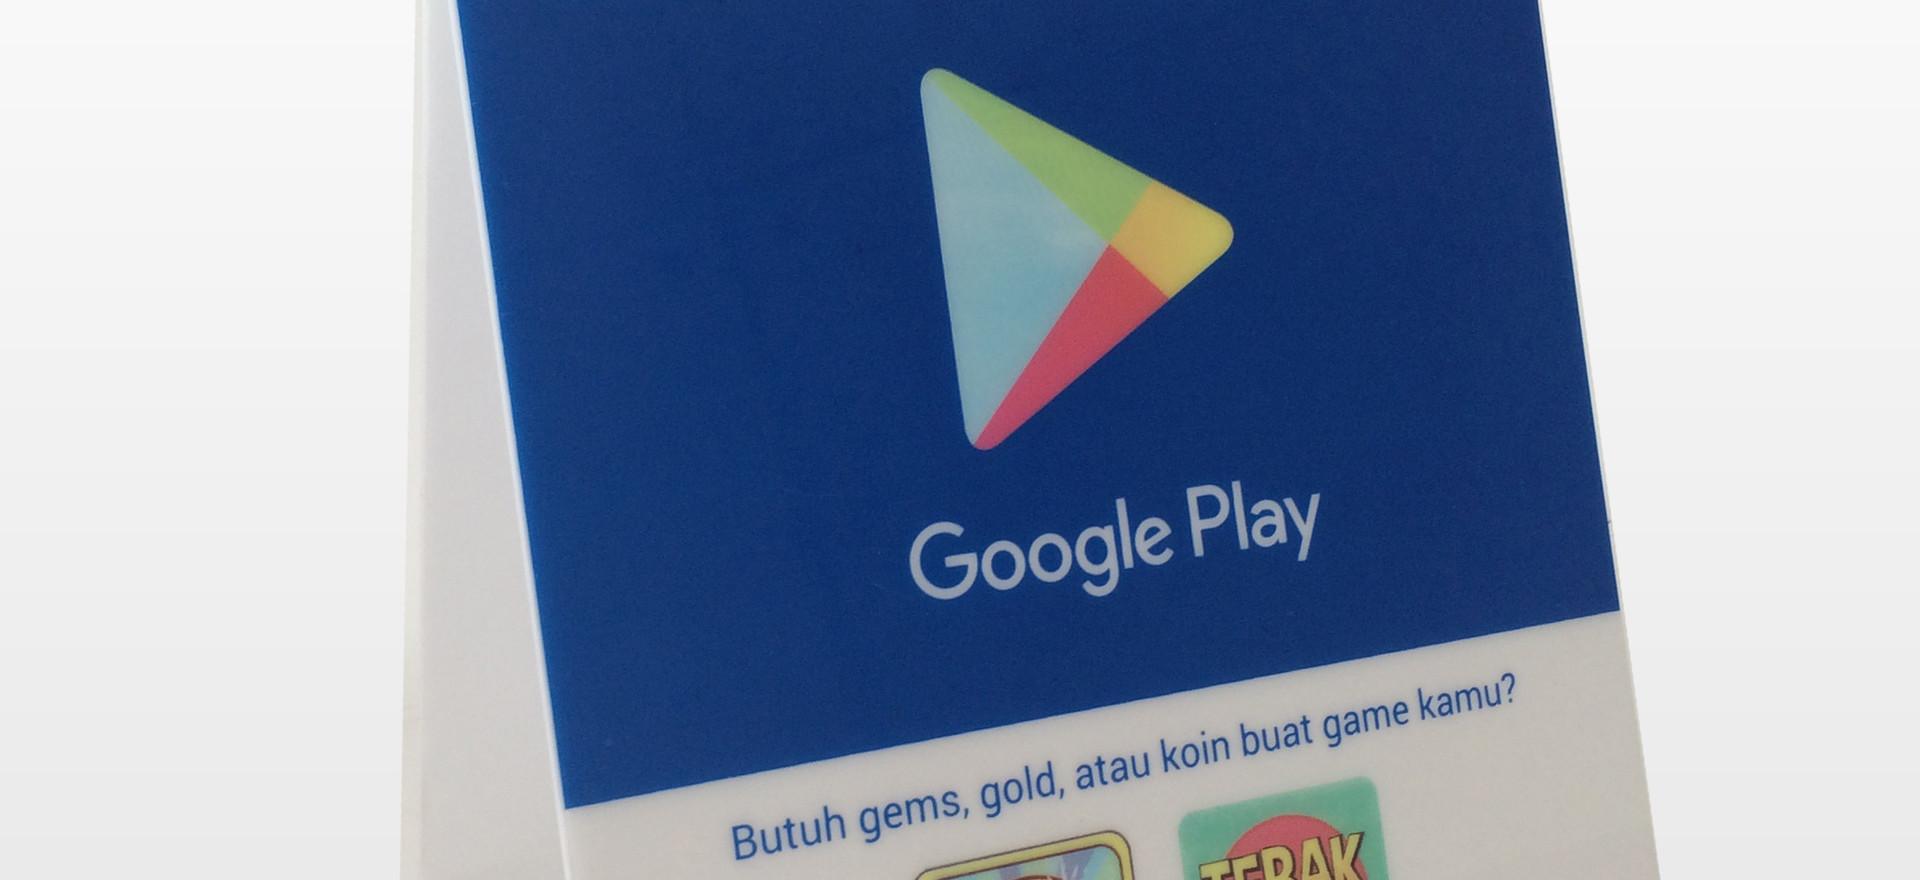 POP Acrylic Tent Card - Google Play Mockup